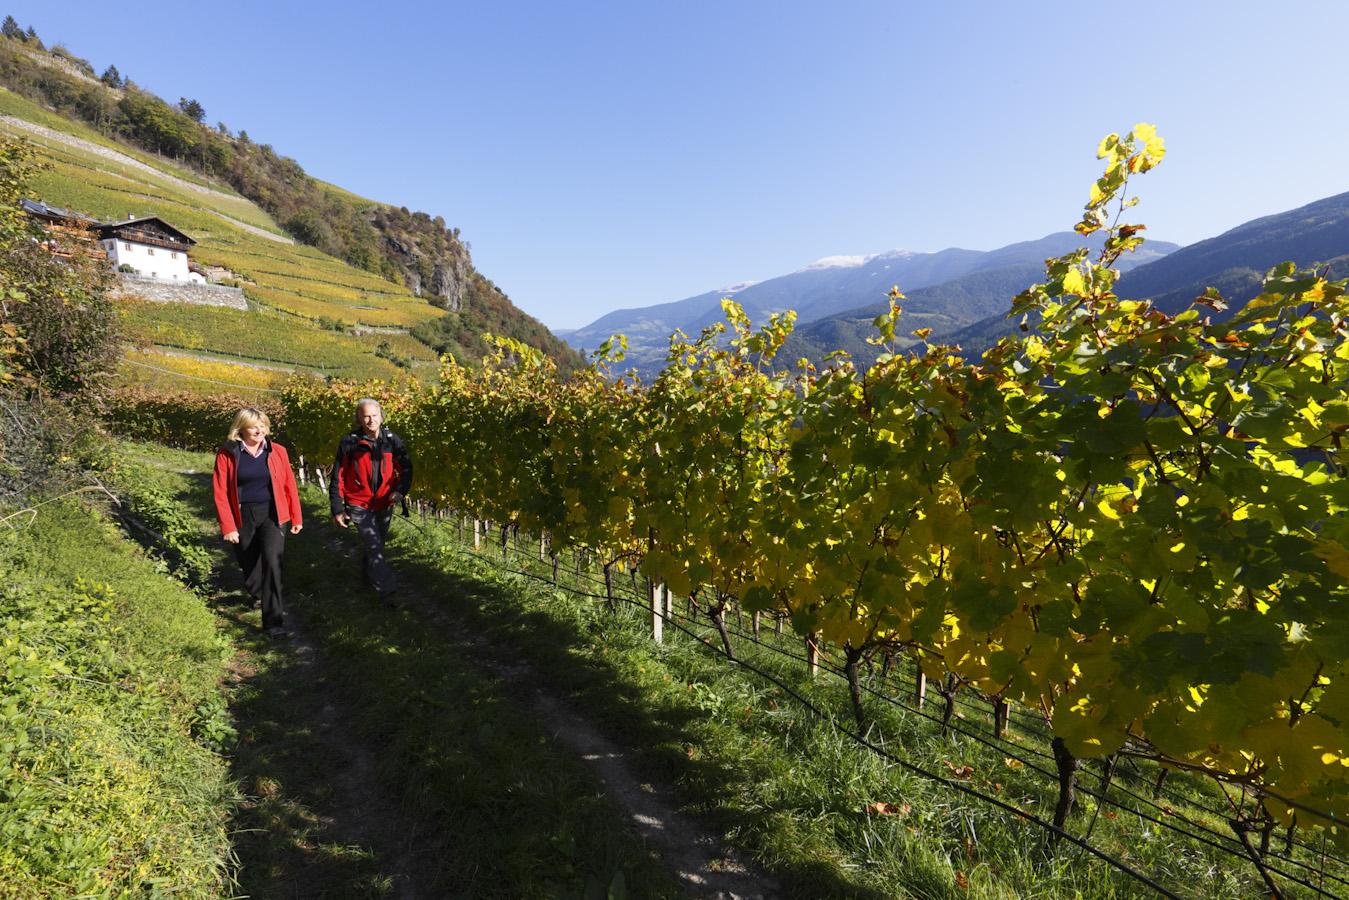 Podzim na farmách v Jižním Tyrolsku